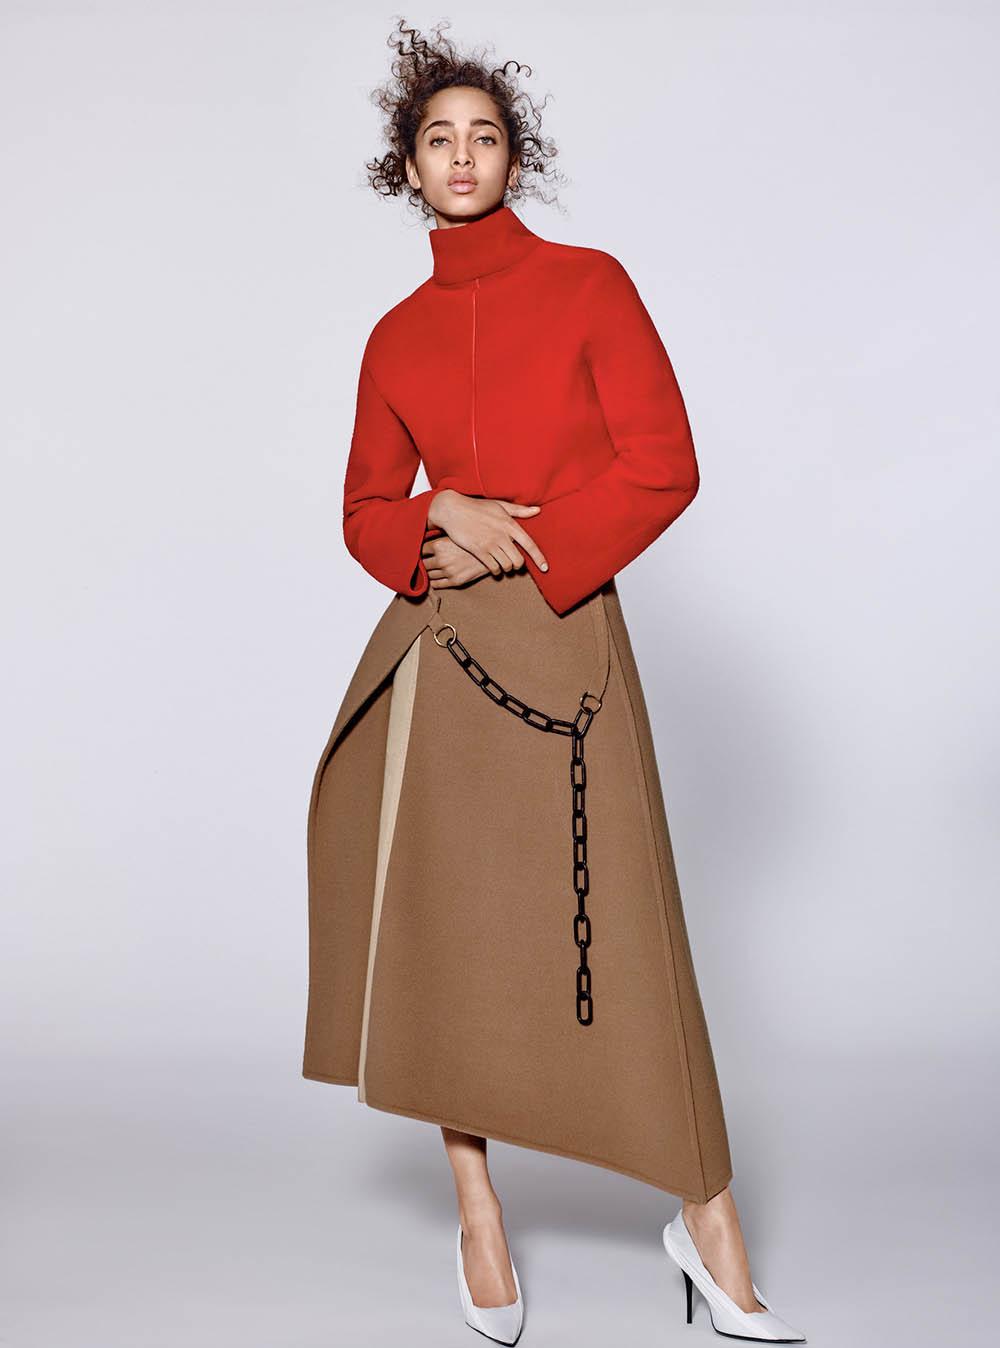 Yasmin Wijnaldum by Richard Burbridge for Vogue China November 2017